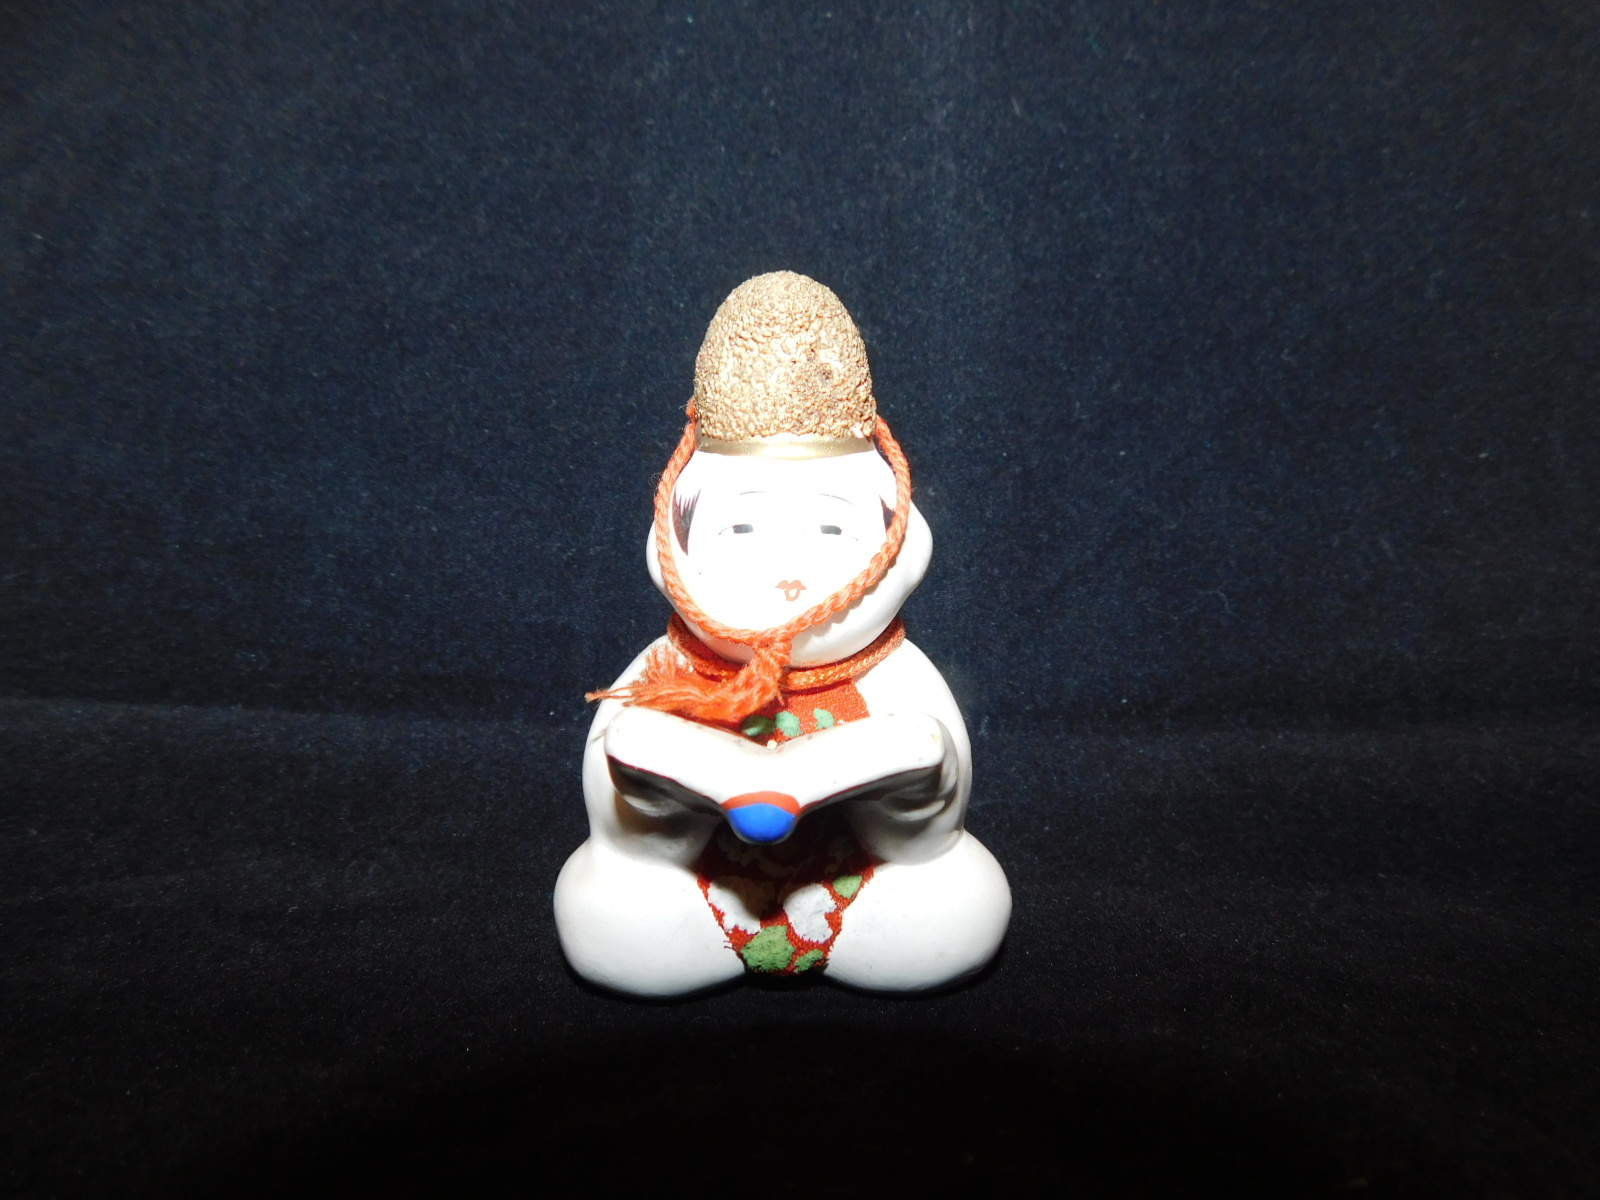 童子人形(本) Douji doll(japanese(book)